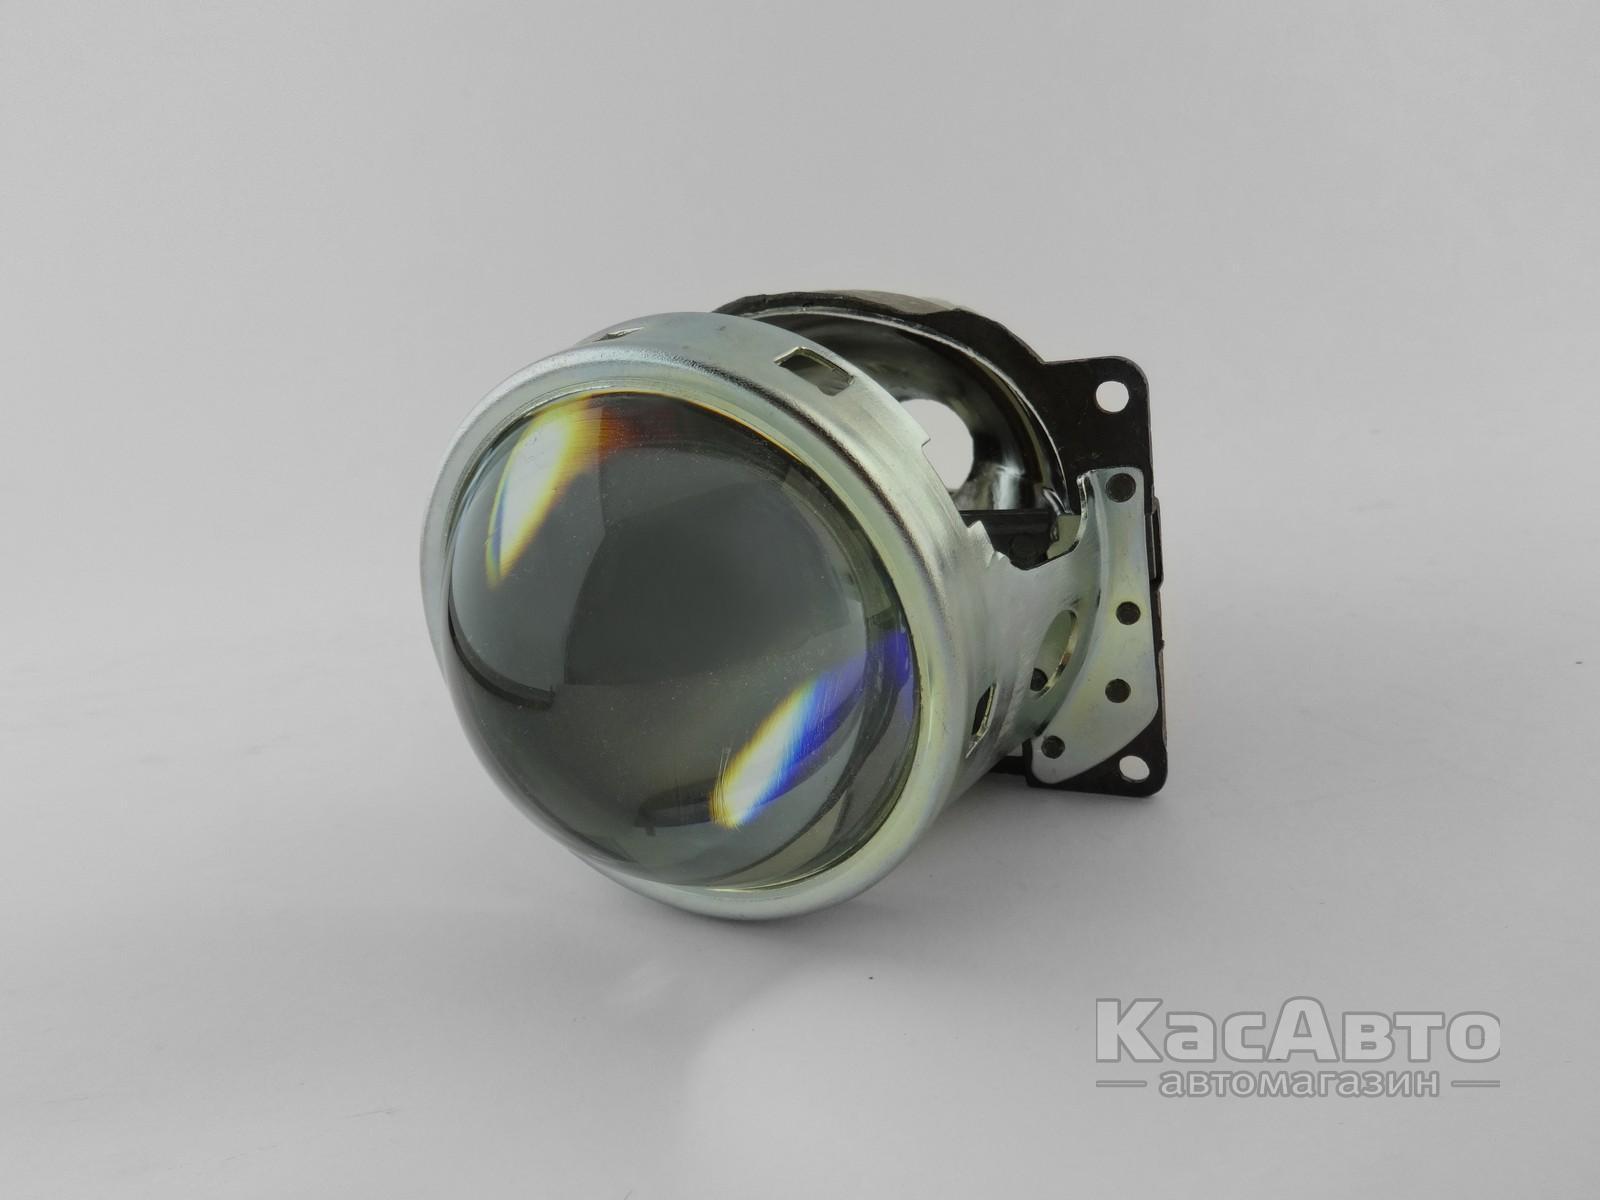 Bi-lens_Infolight_G6_04